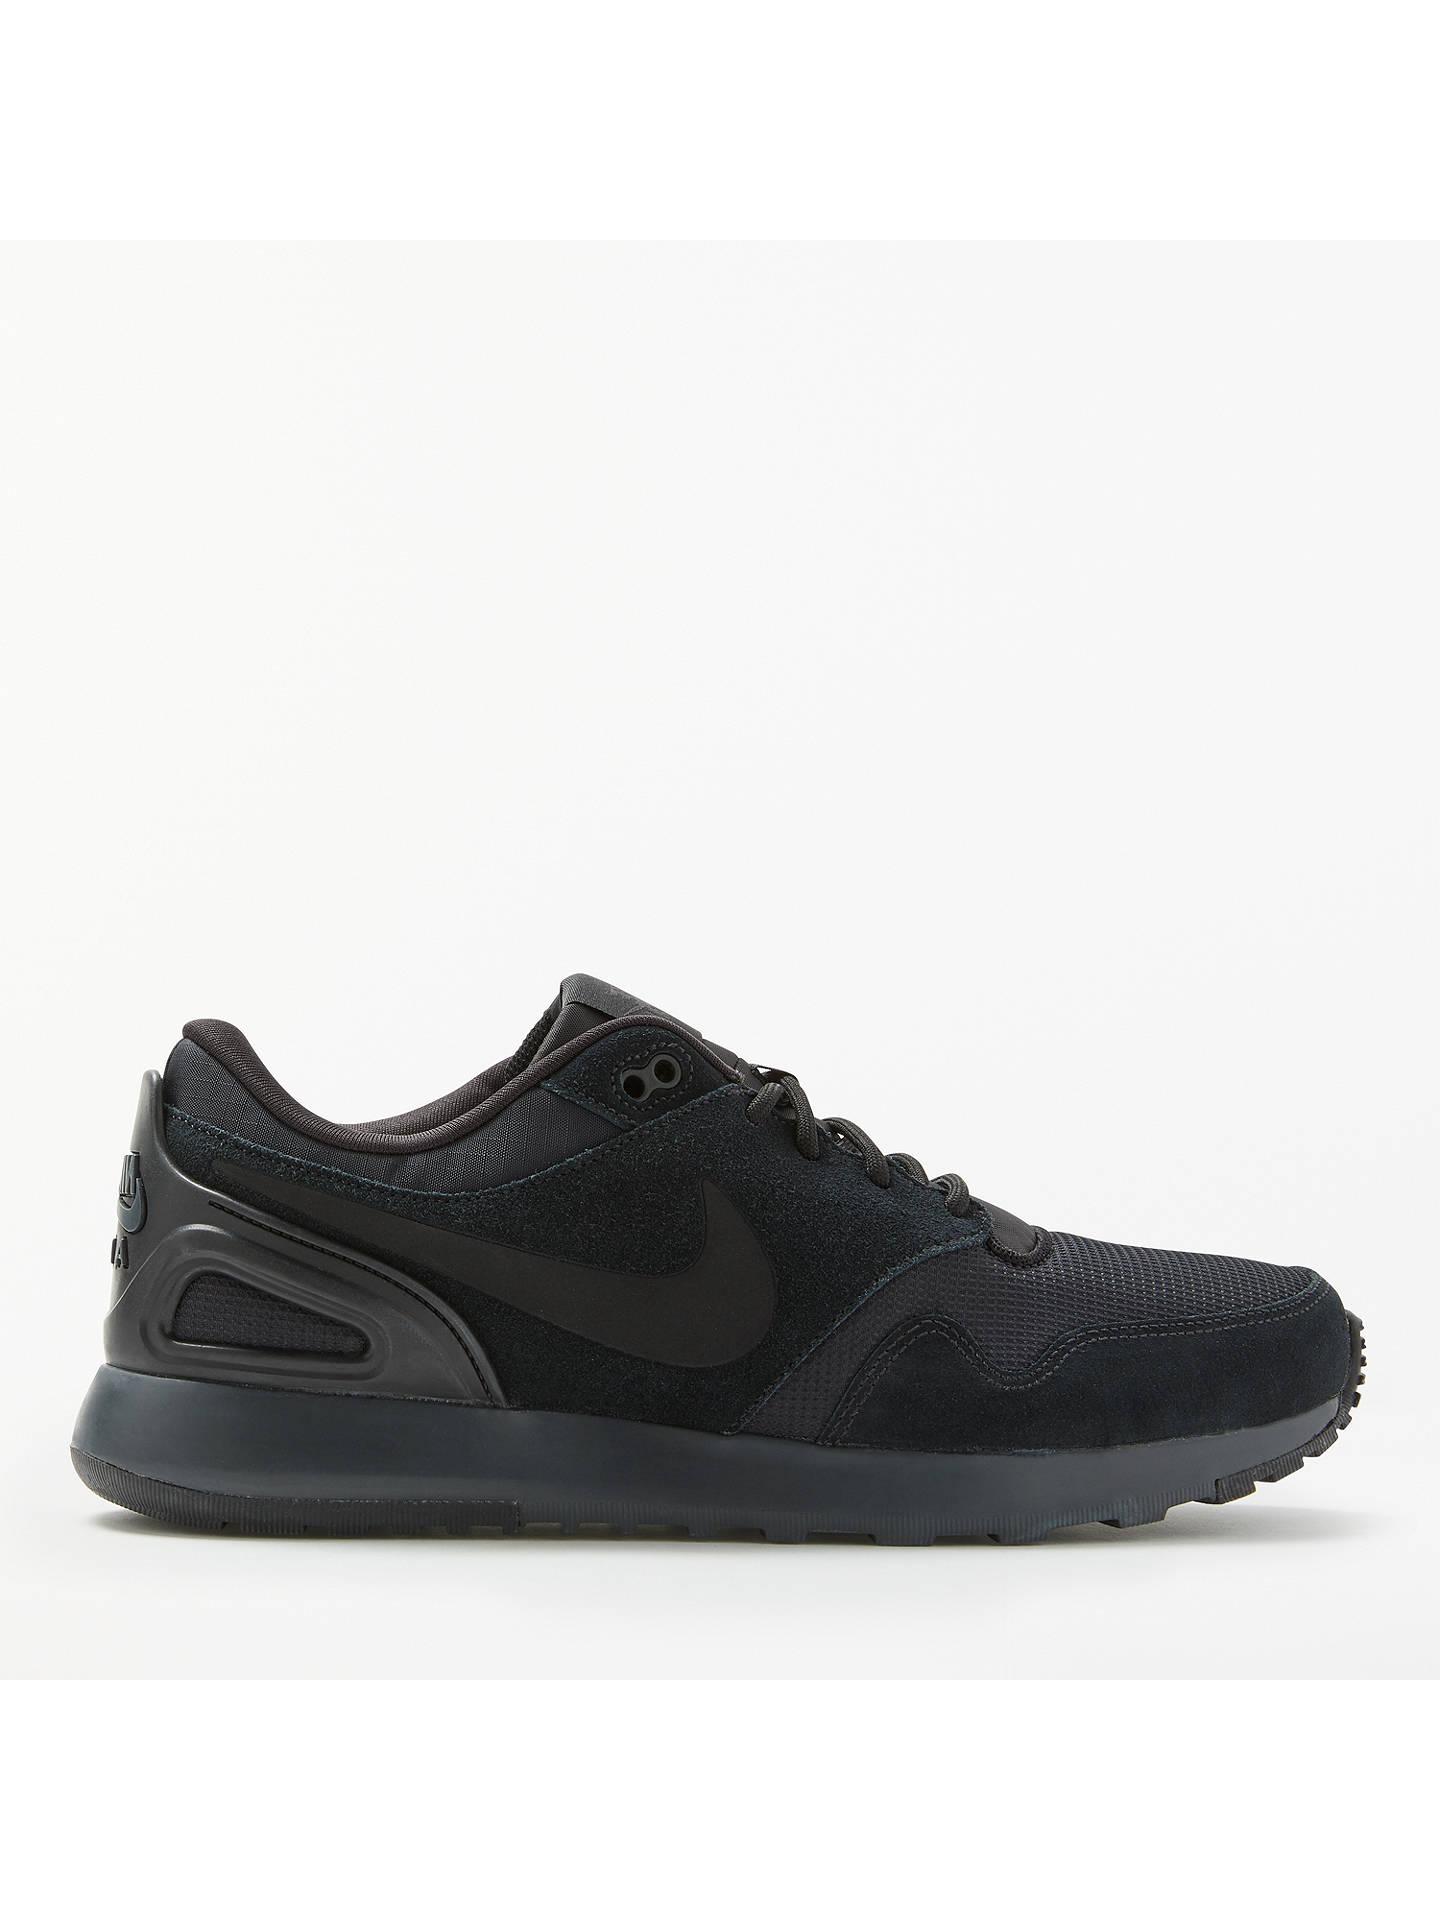 low priced 749d7 4af4a Buy Nike Air Vibenna Men s Trainers, Black, 7 Online at johnlewis. ...